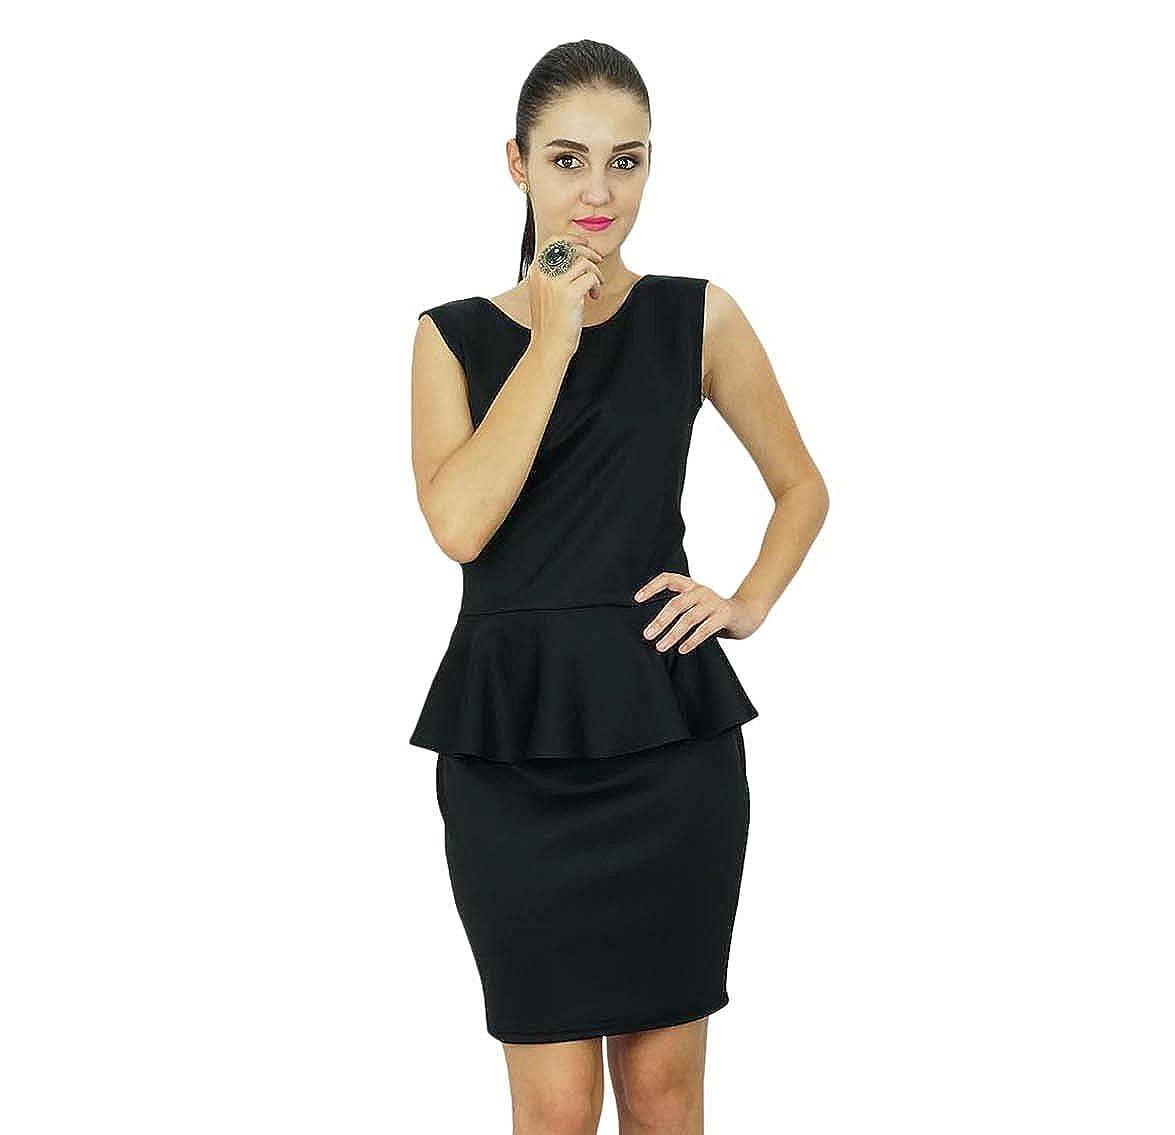 eafcb83ff0bc Bimba Womens Classic Peplum Wiggle Pencil Midi Dress at Amazon Women's  Clothing store: